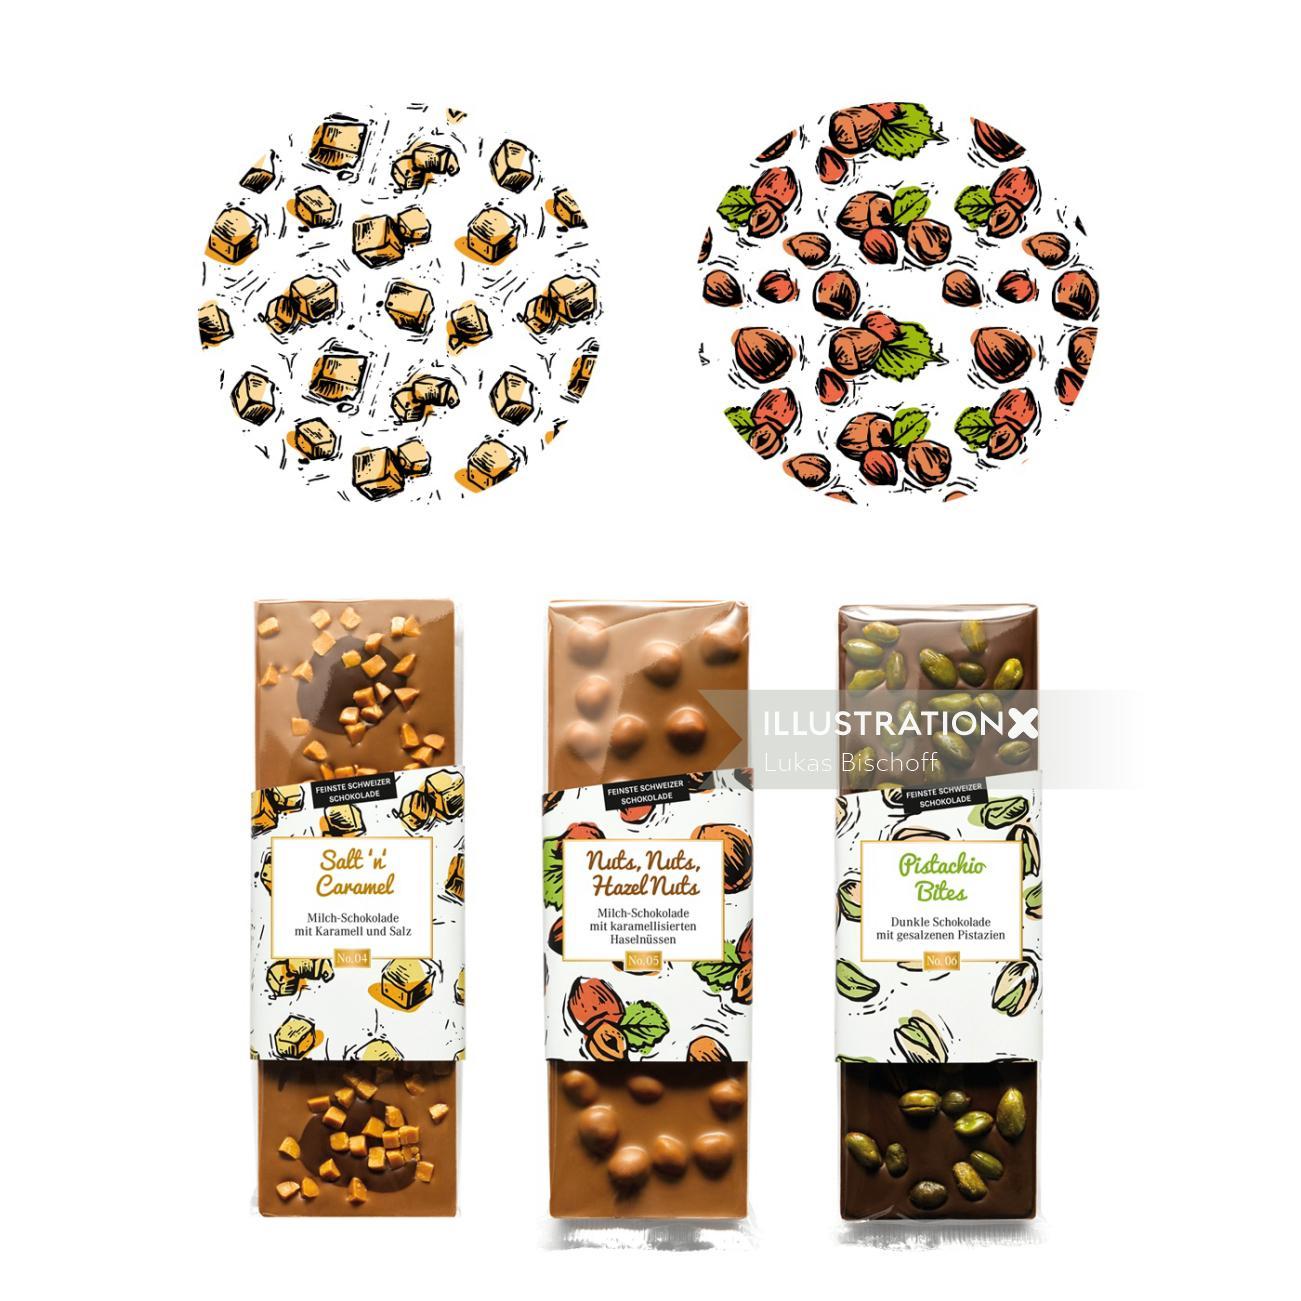 food & drink package cover illustration